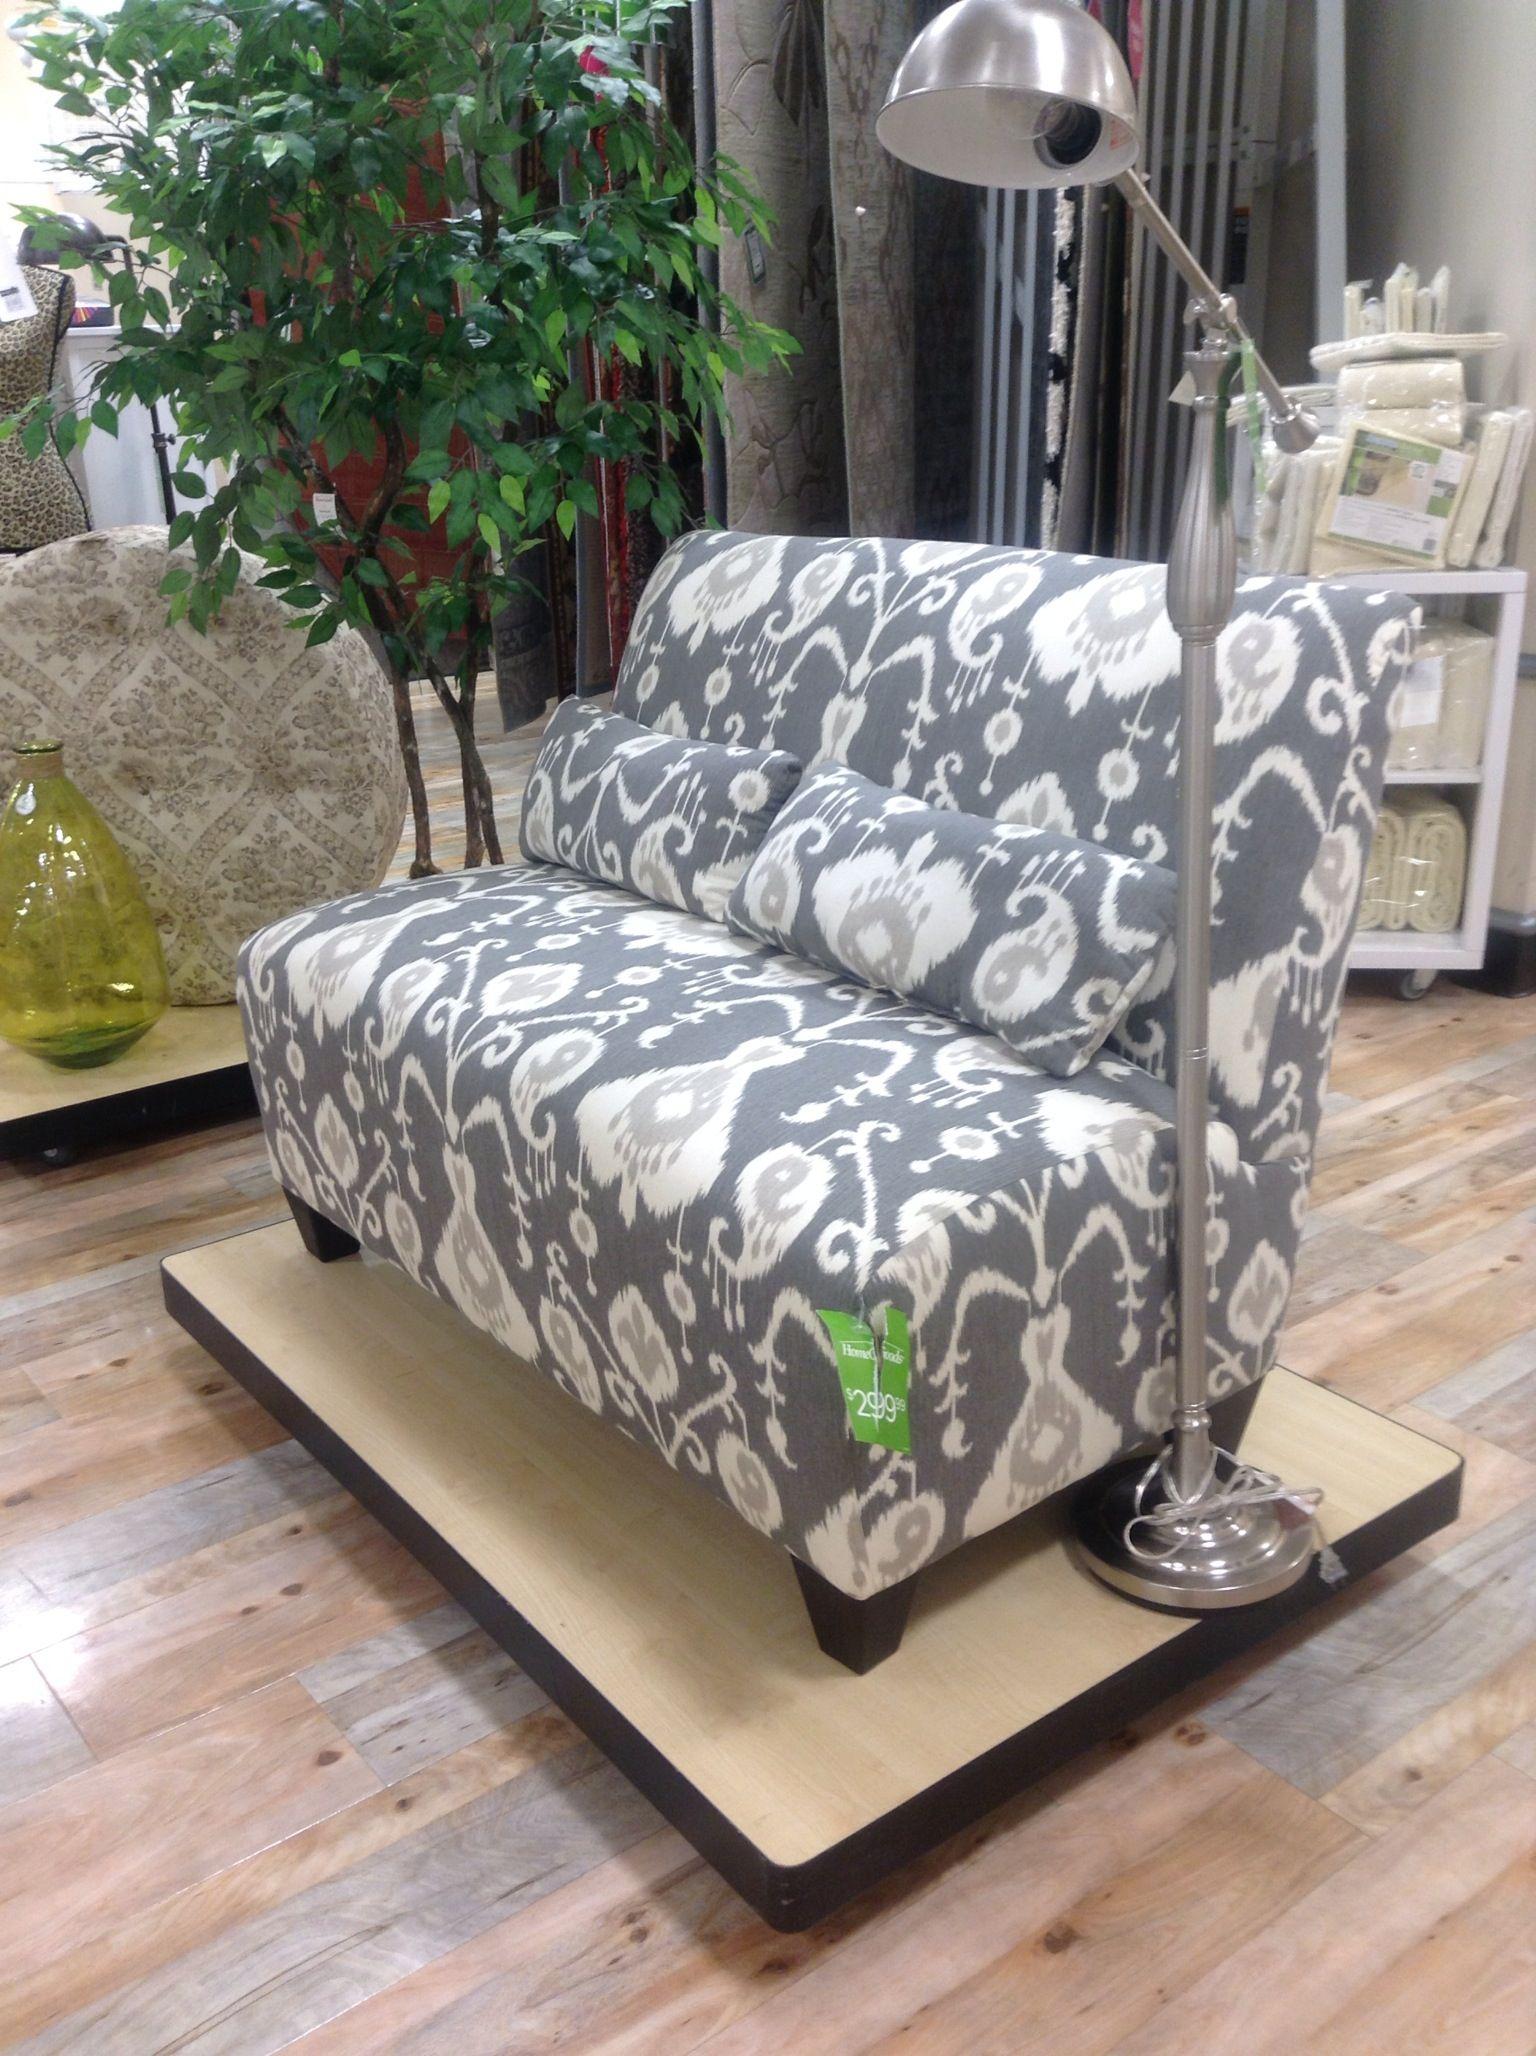 Home Goods Settee 300 Too Small Sofa Bench